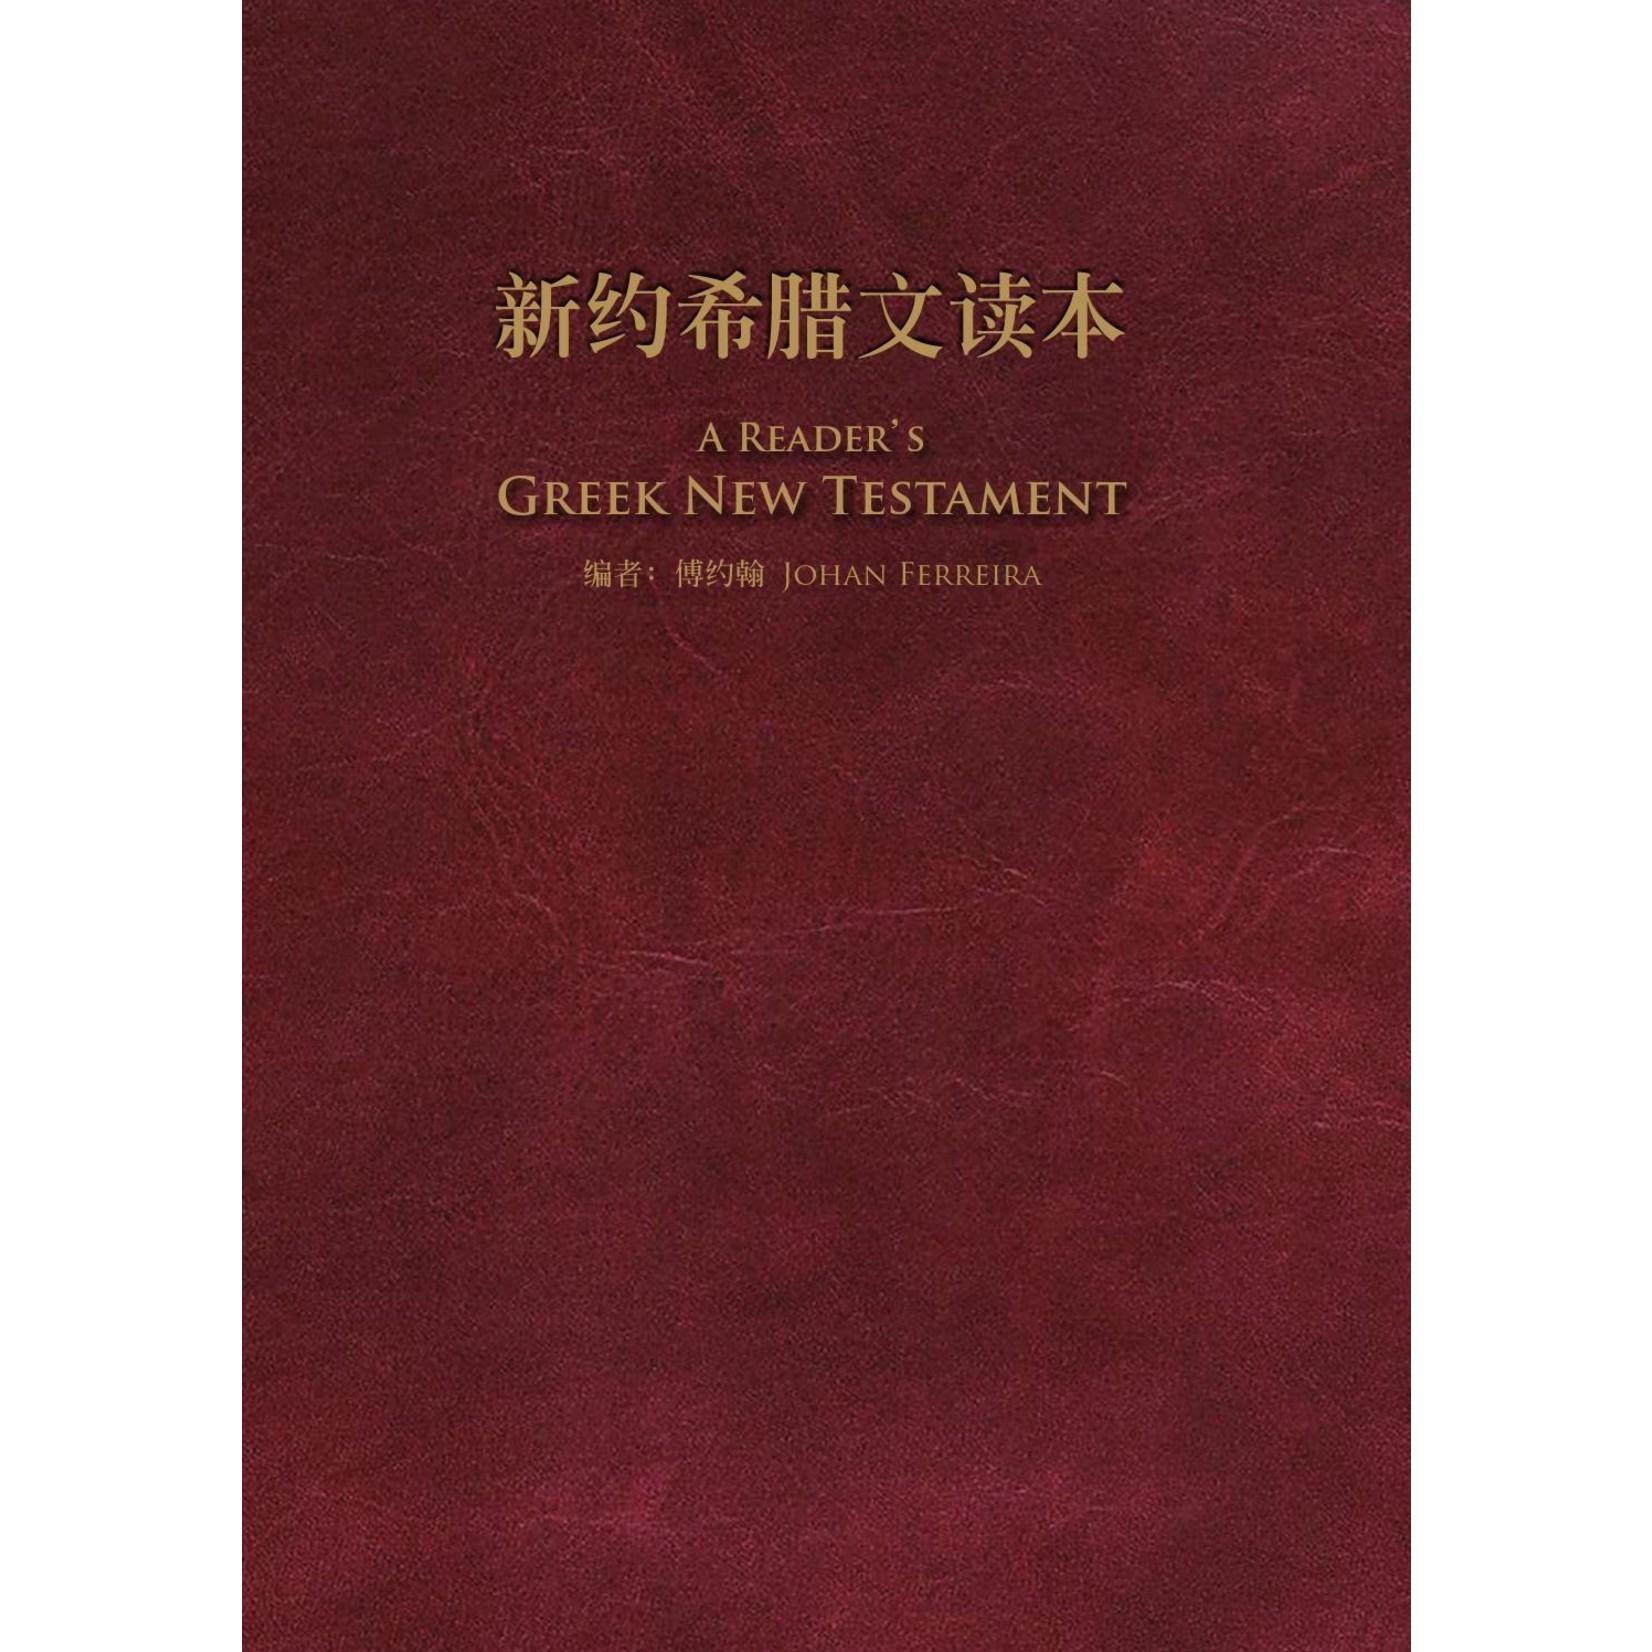 美國麥種傳道會 AKOWCM 新约希腊文读本 A Reader's Greek New Testament